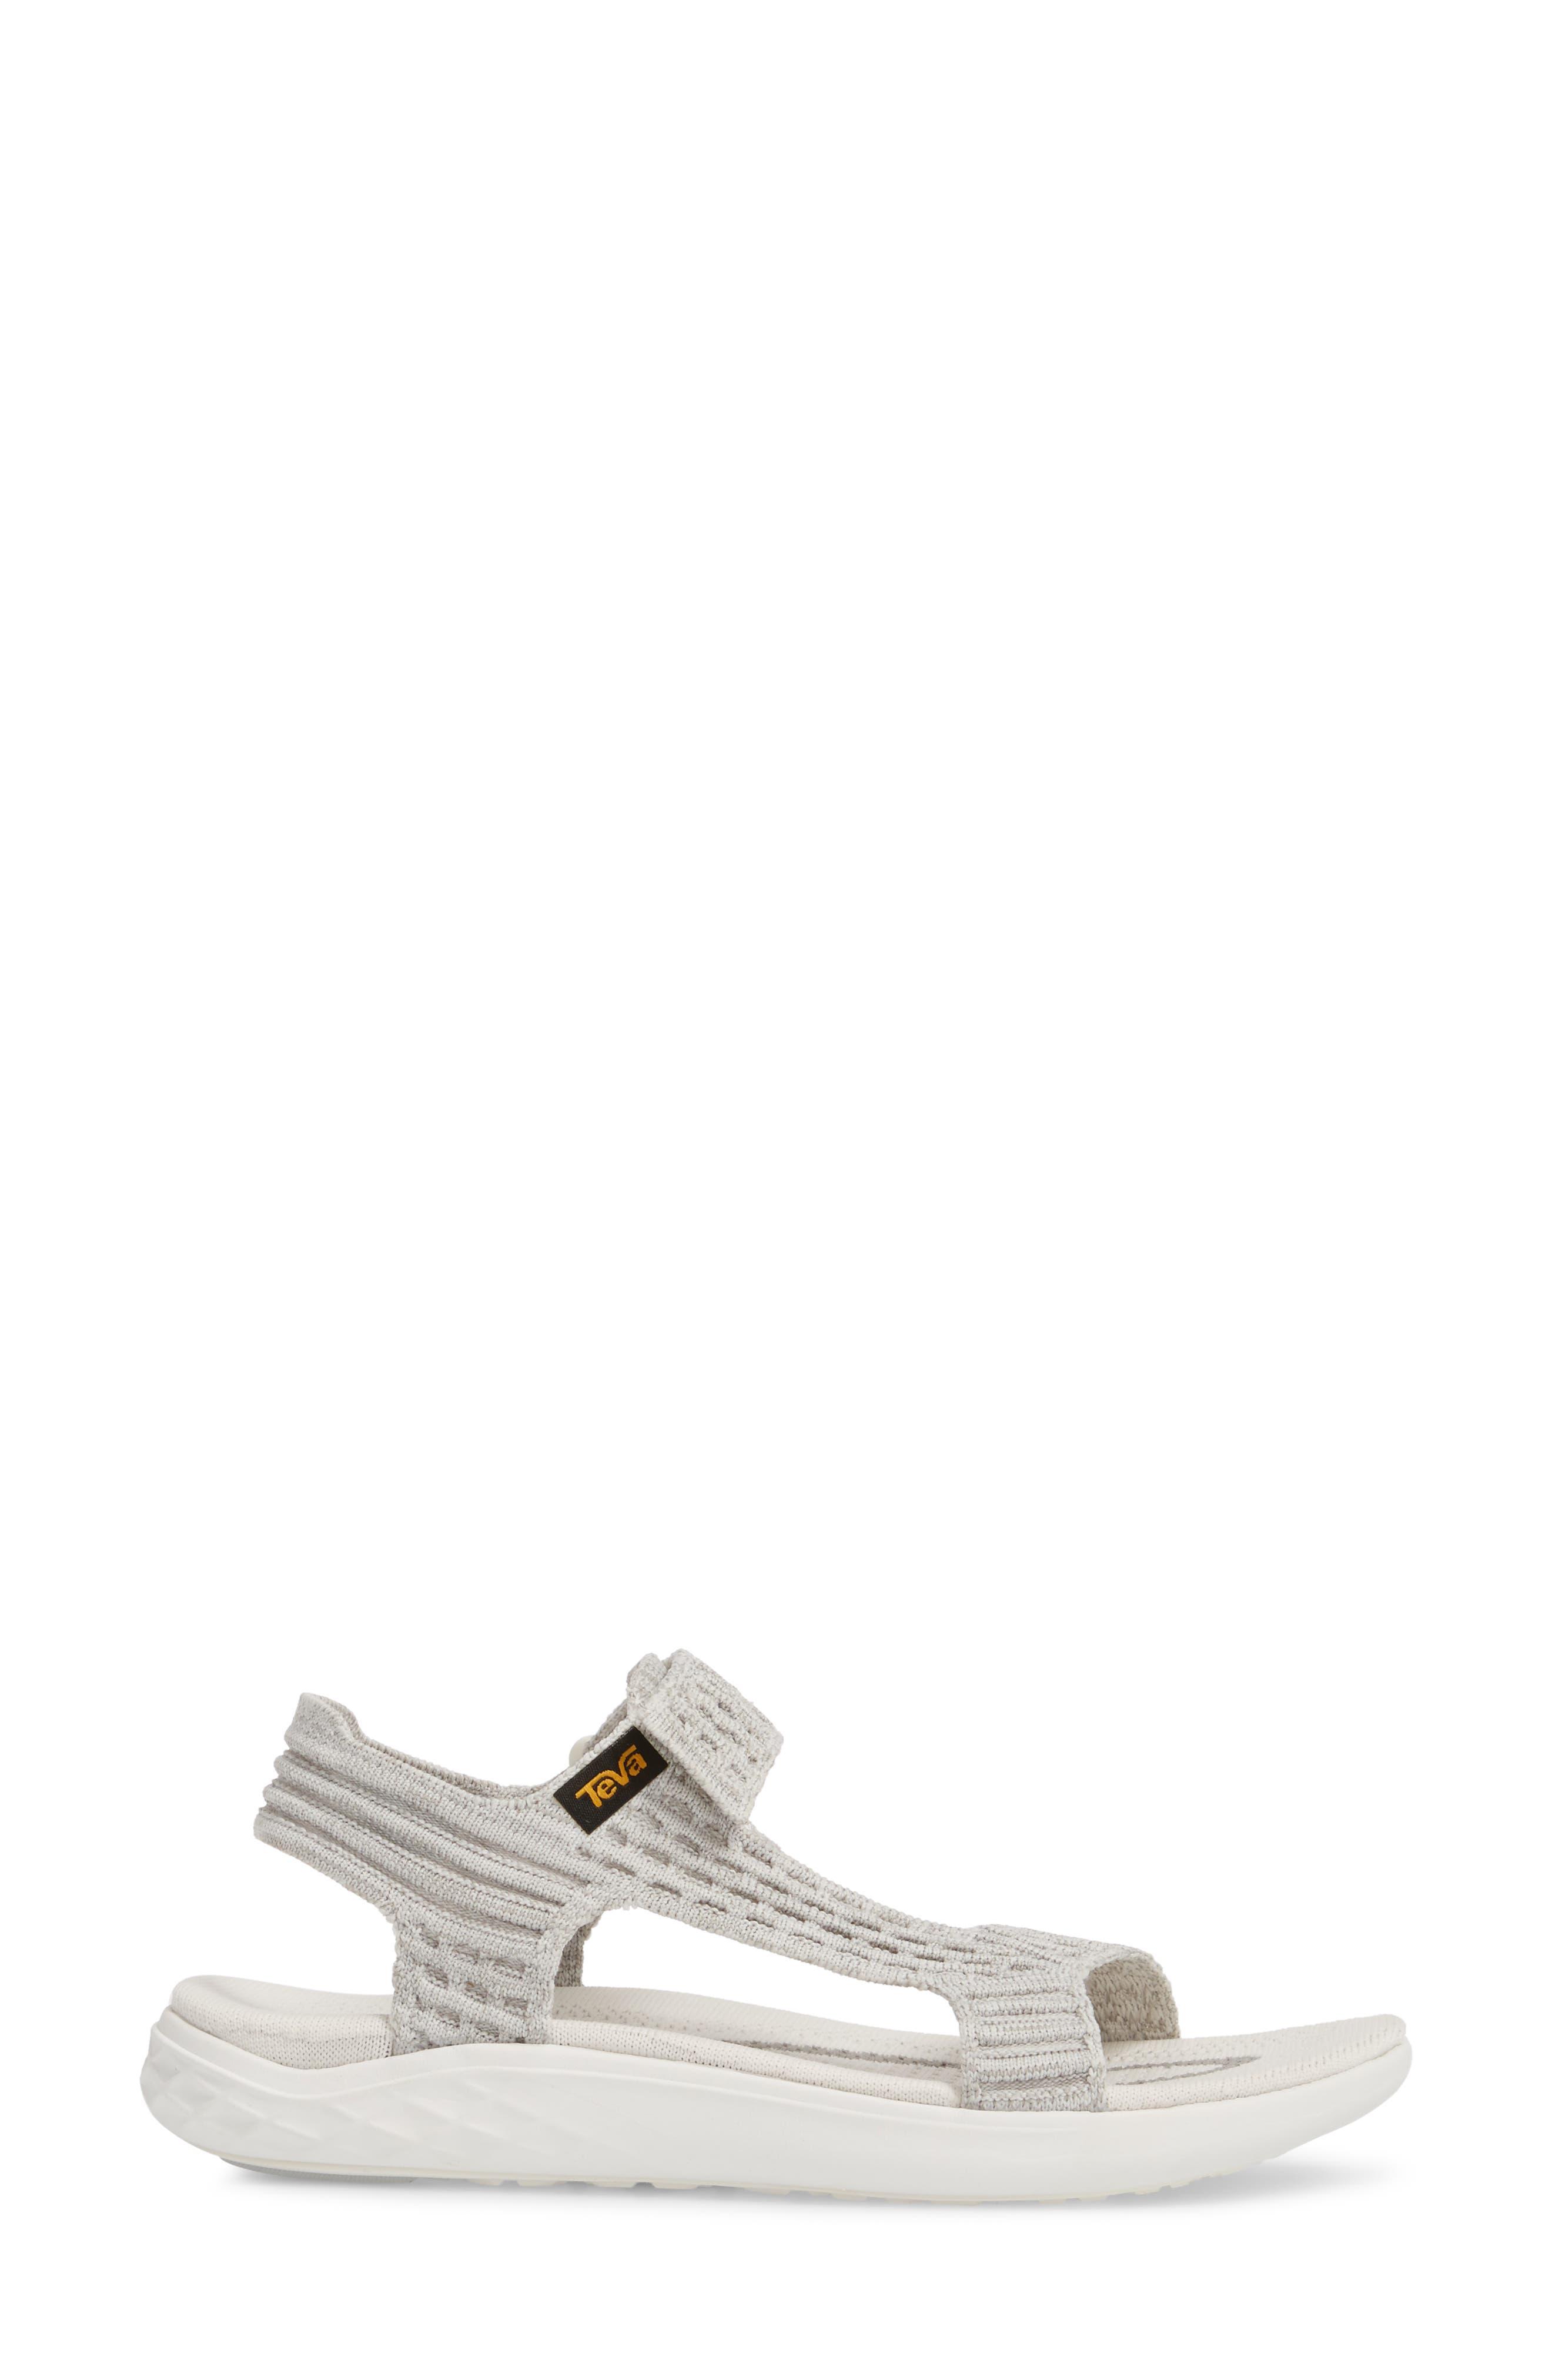 Terra Float 2 Knit Universal Sandal,                             Alternate thumbnail 10, color,